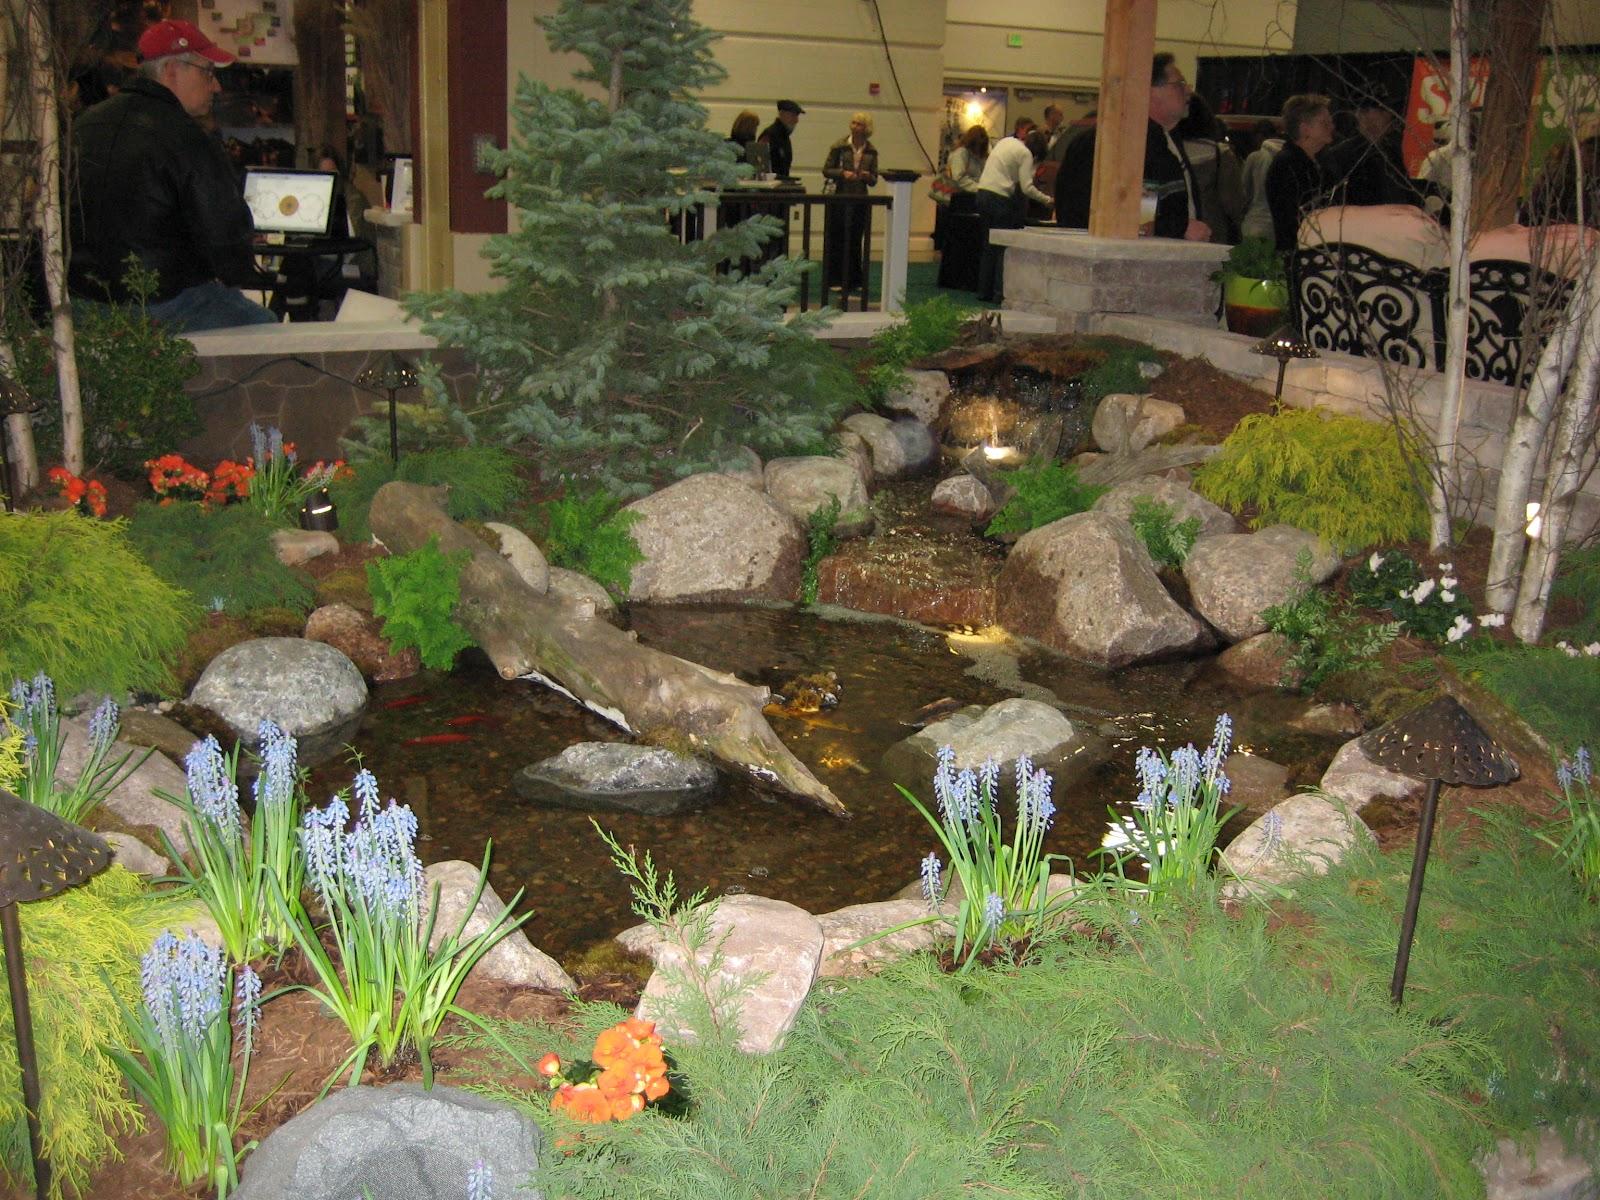 2012 realtors home and garden show - Simple Garden Ideas For The Average Home